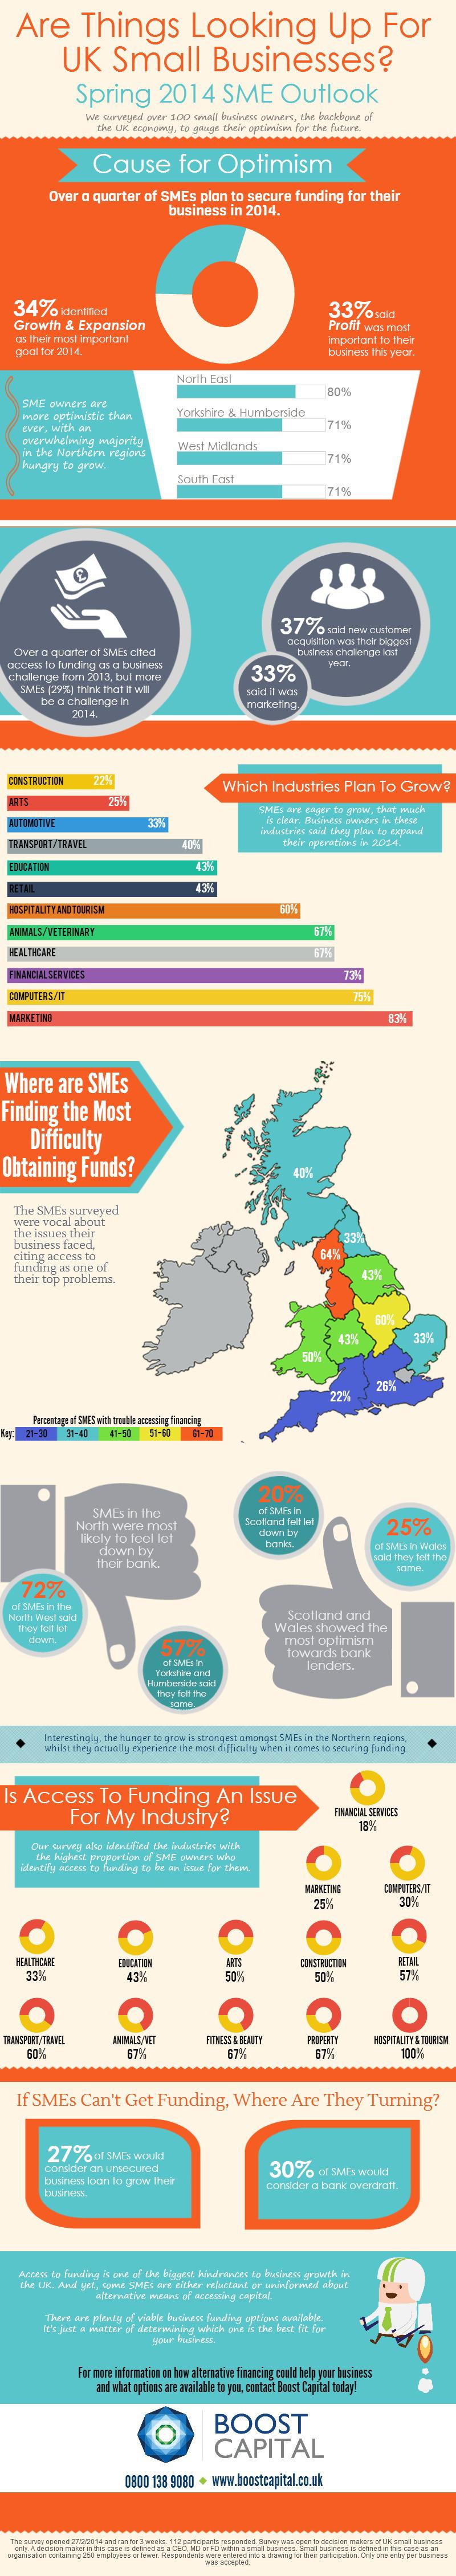 UK Small Business Growth & Funding Needs